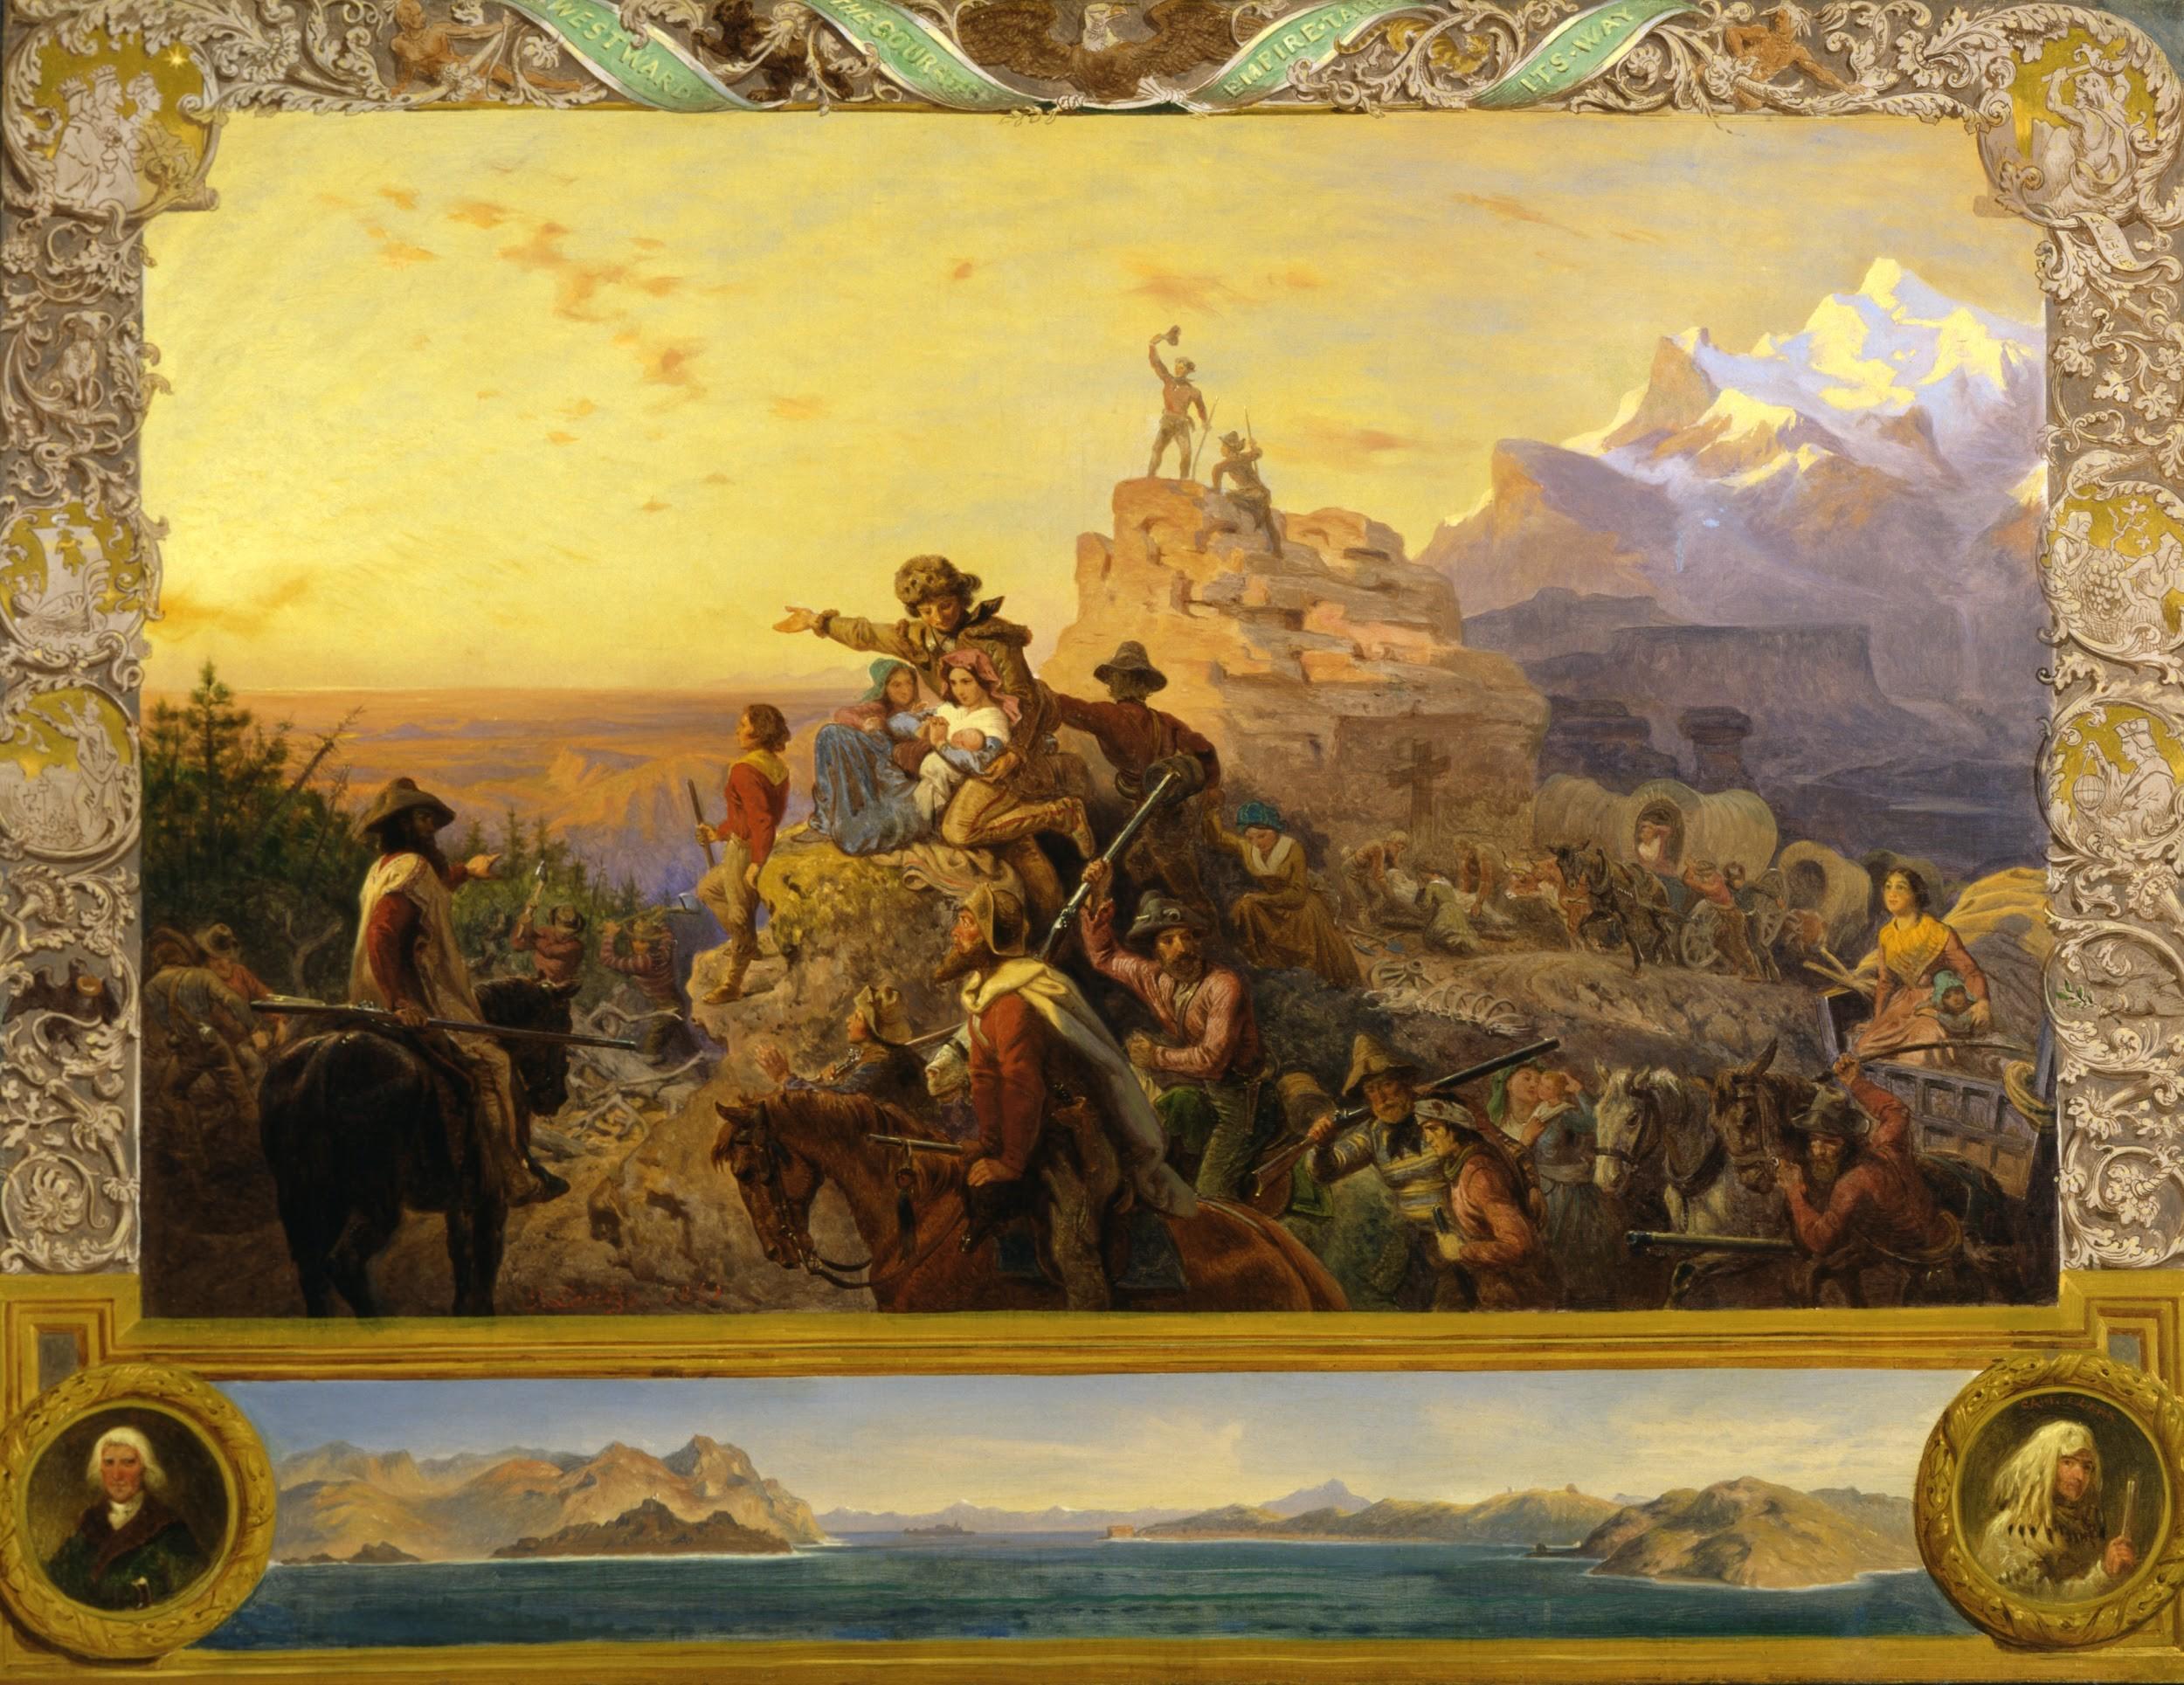 Emanuel Leutze, Westward the Course of Empire Takes Its Way (1861)